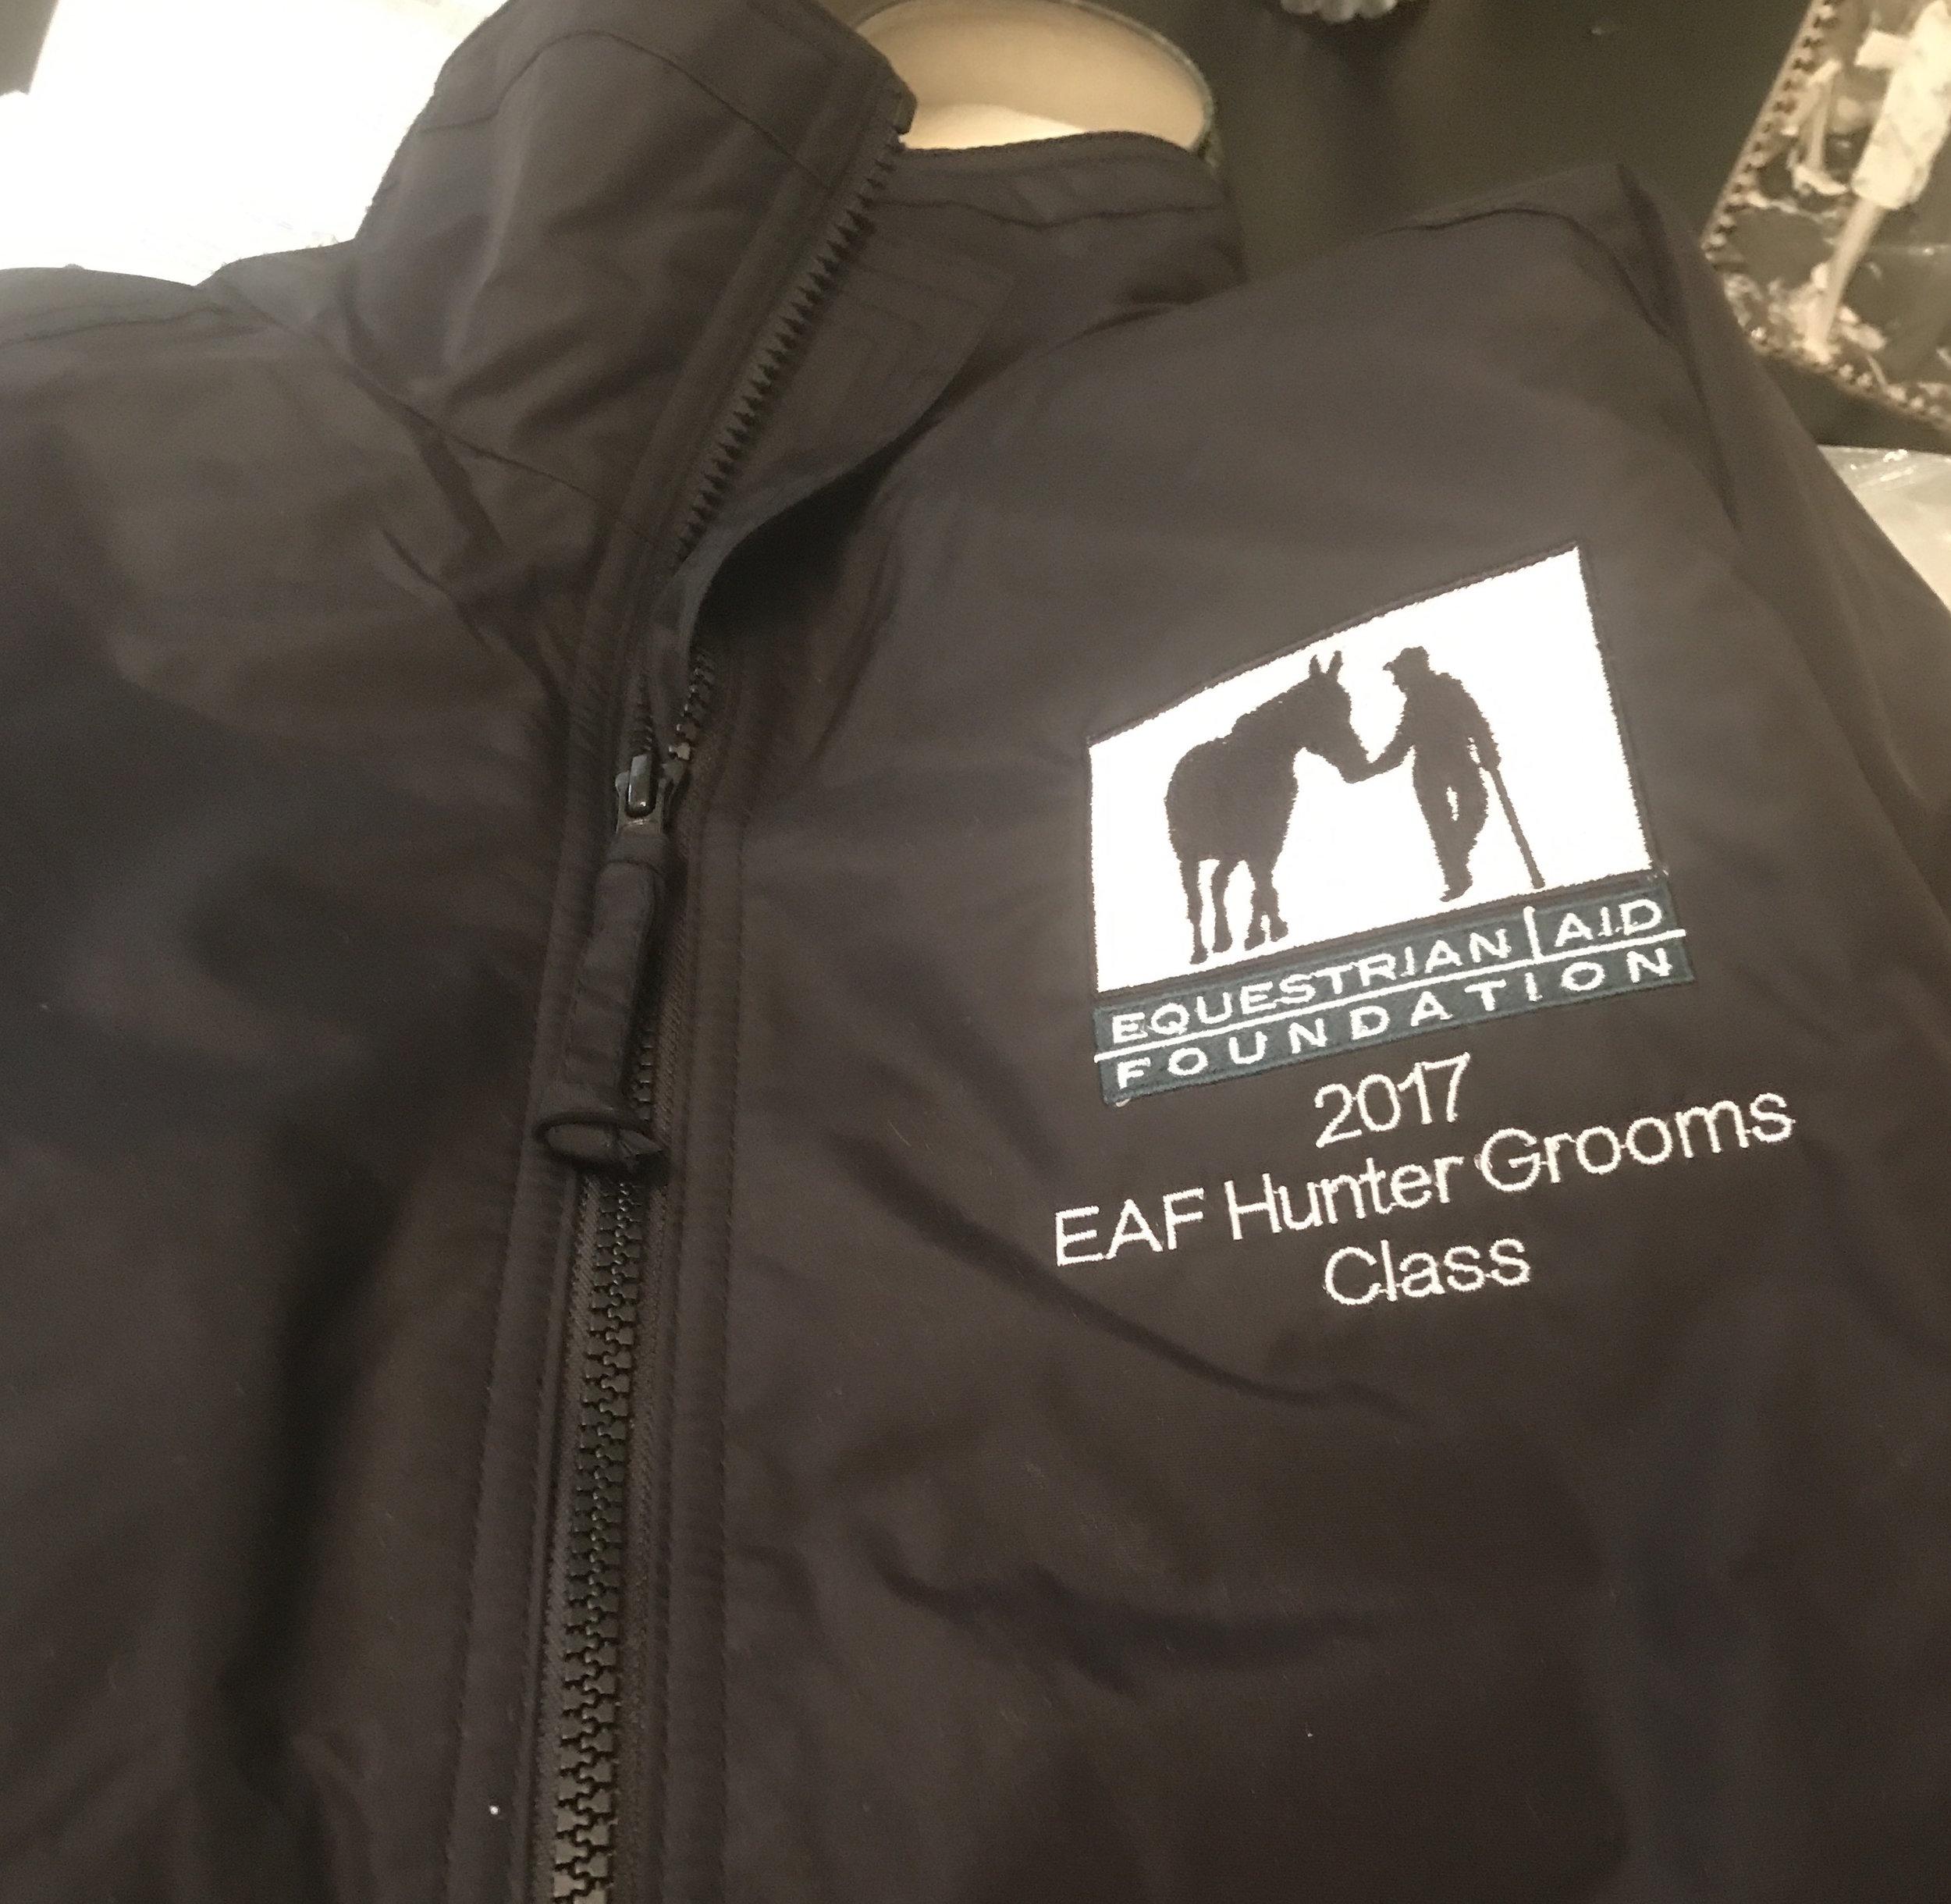 Missy Luczak-Smith and Doug Smith donated The Clothes Horse Equestrian Aid Foundation jacket. Photo courtesy of Missy Luczak-Smith.